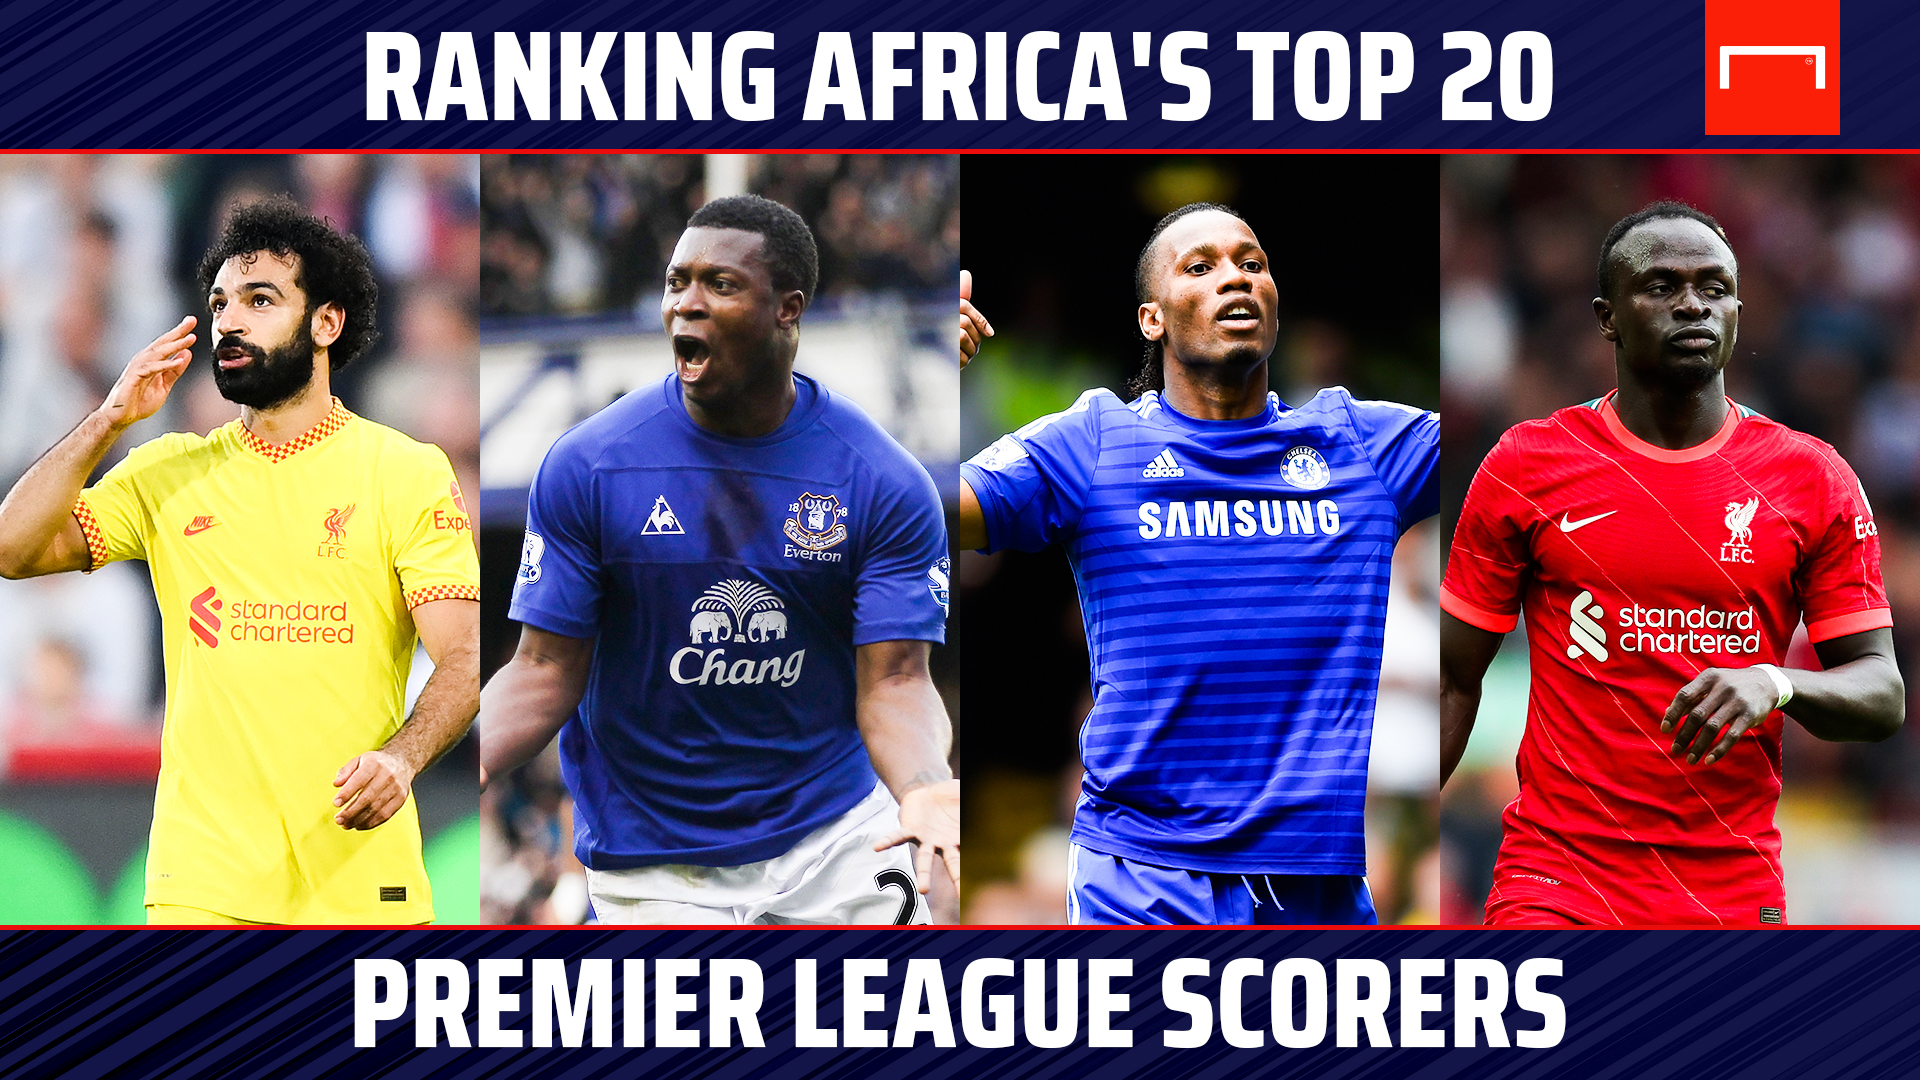 Ranking Africa's top 20 Premier League scorers